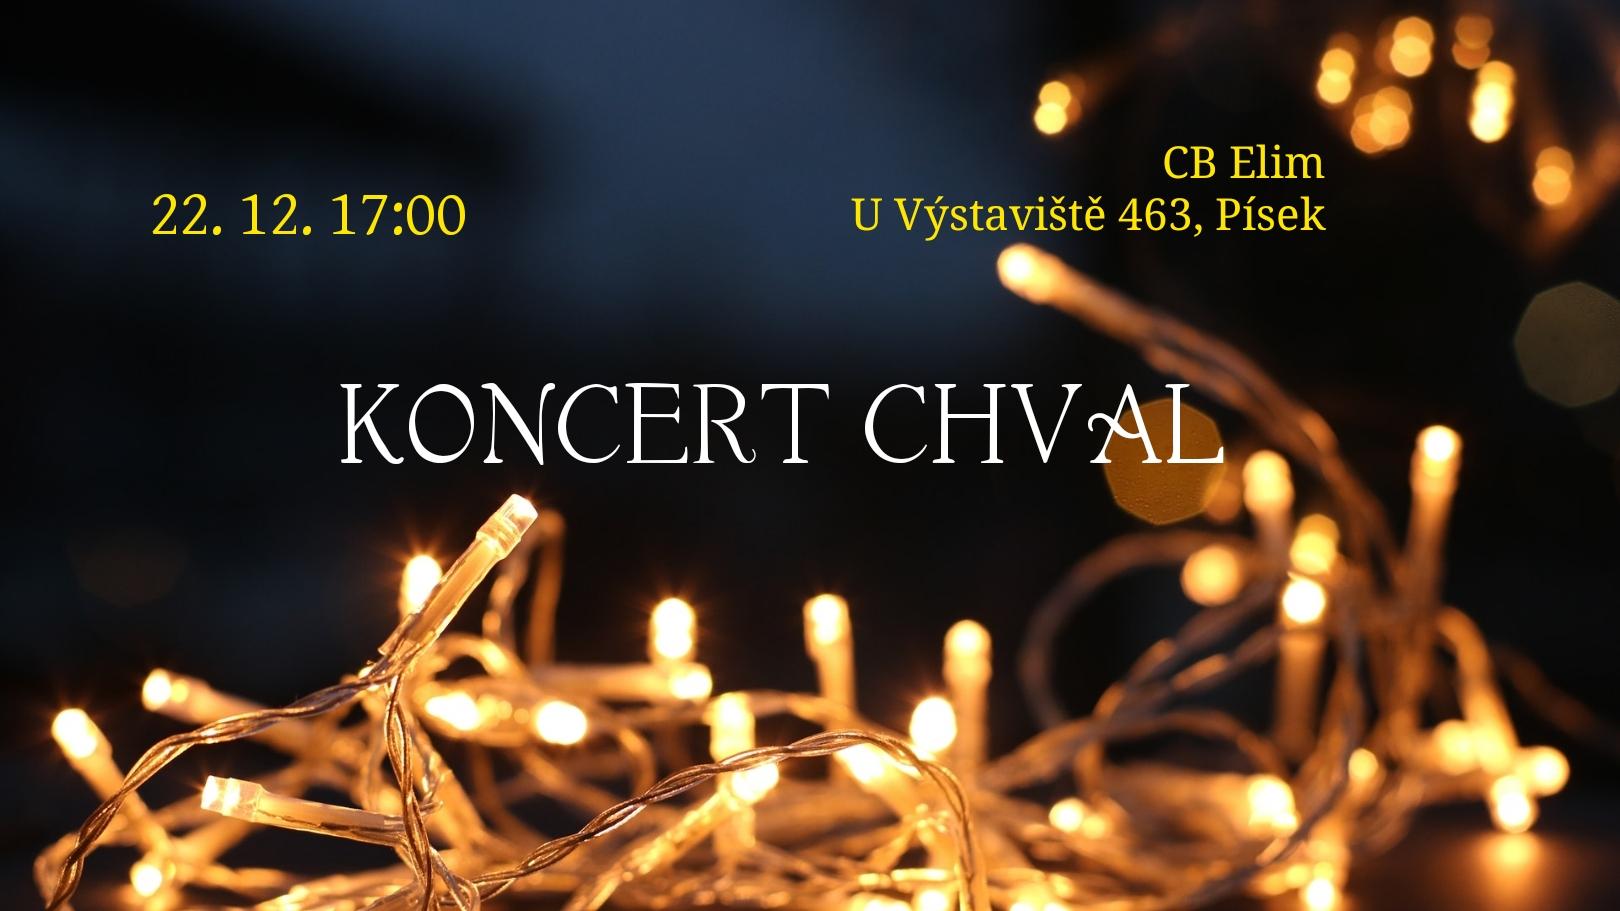 koncert chval kapitálky pozvánka